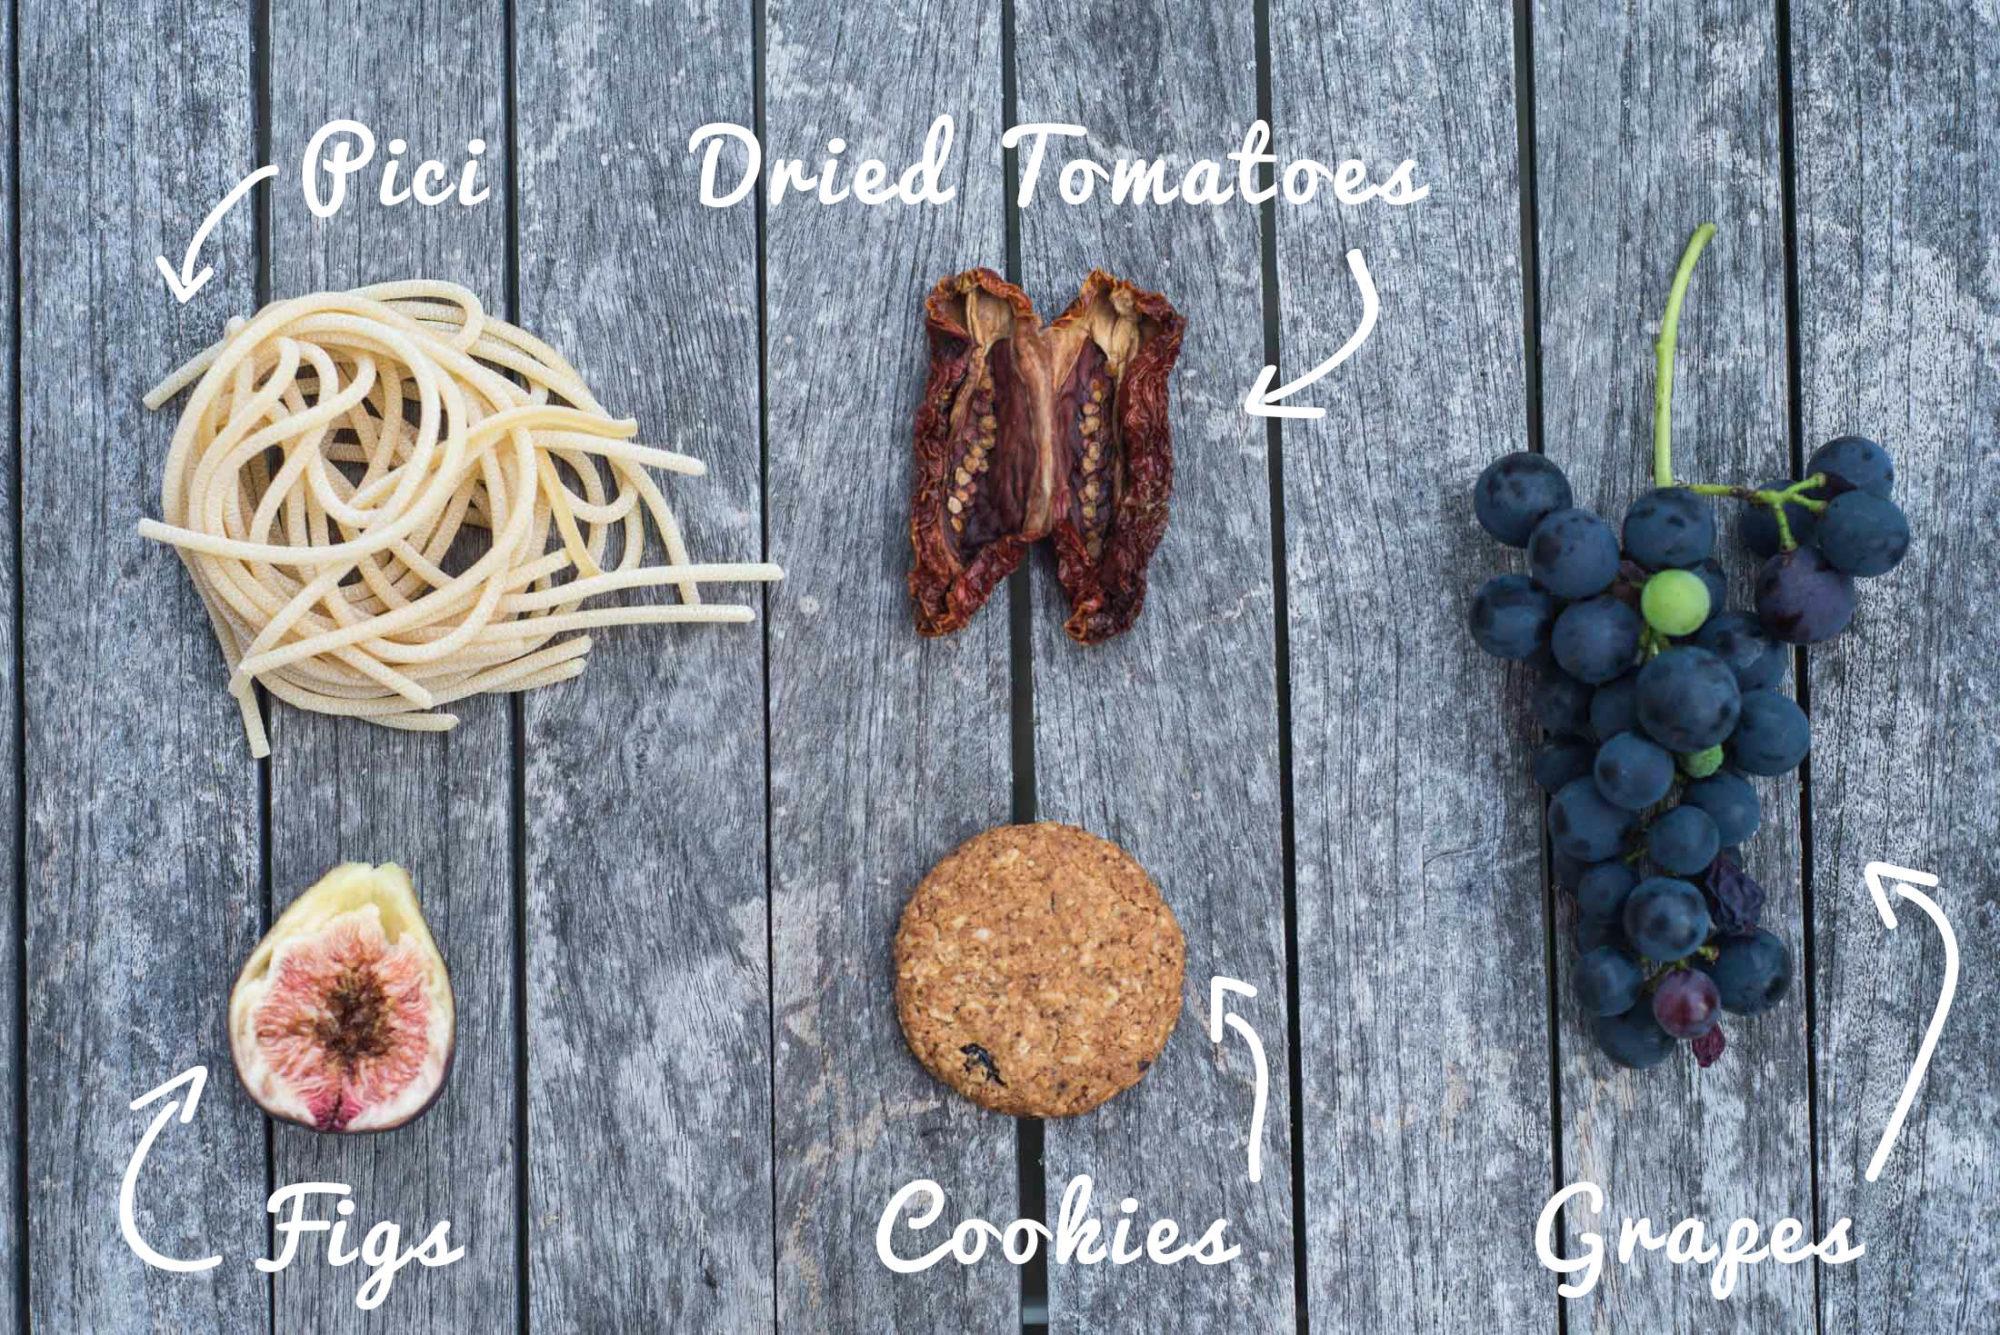 vegan food guide what to eat in tuscany vegan essen in der Toskana